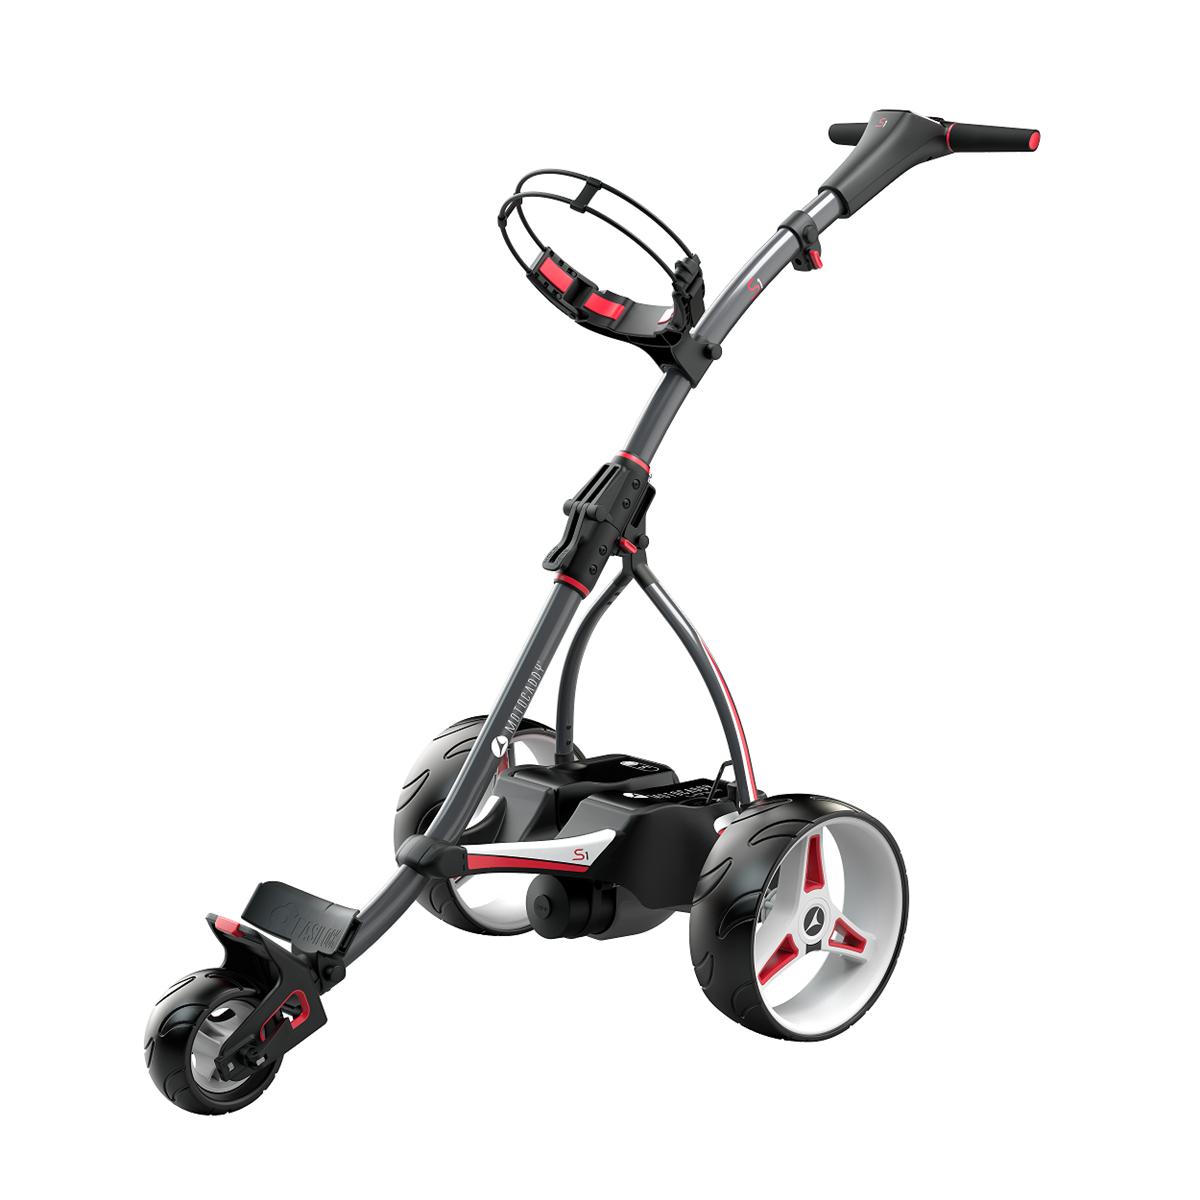 Electric Golf Caddy >> Motocaddy 2019 S1 Lithium Battery Electric Golf Trolley